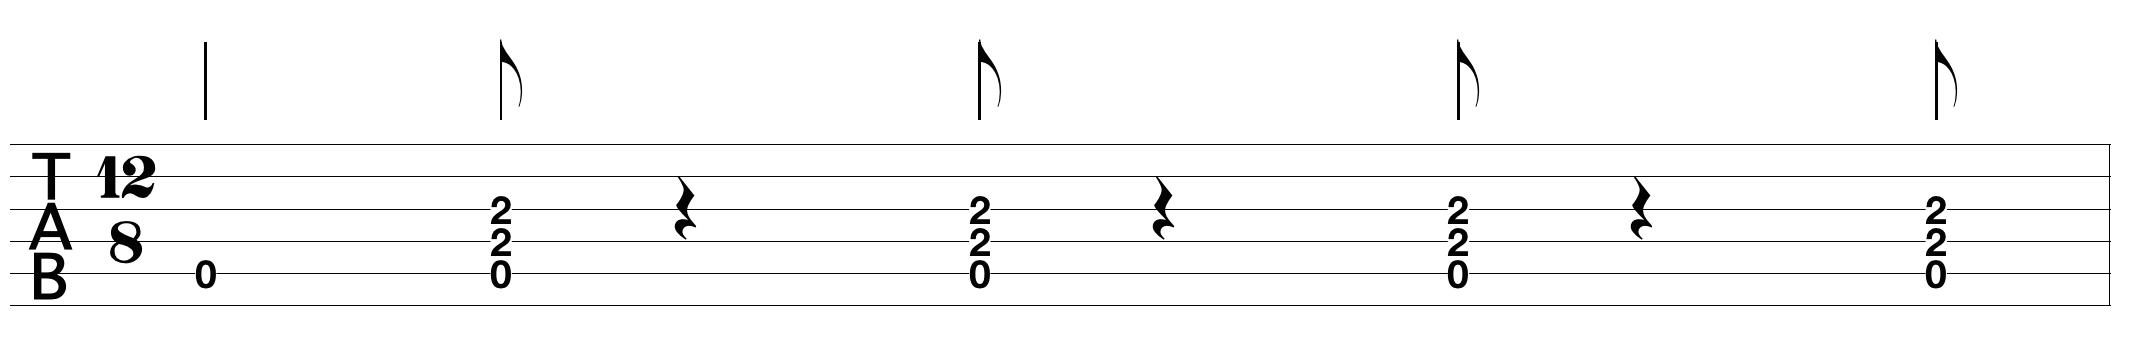 blues-guitar-tips_1.png